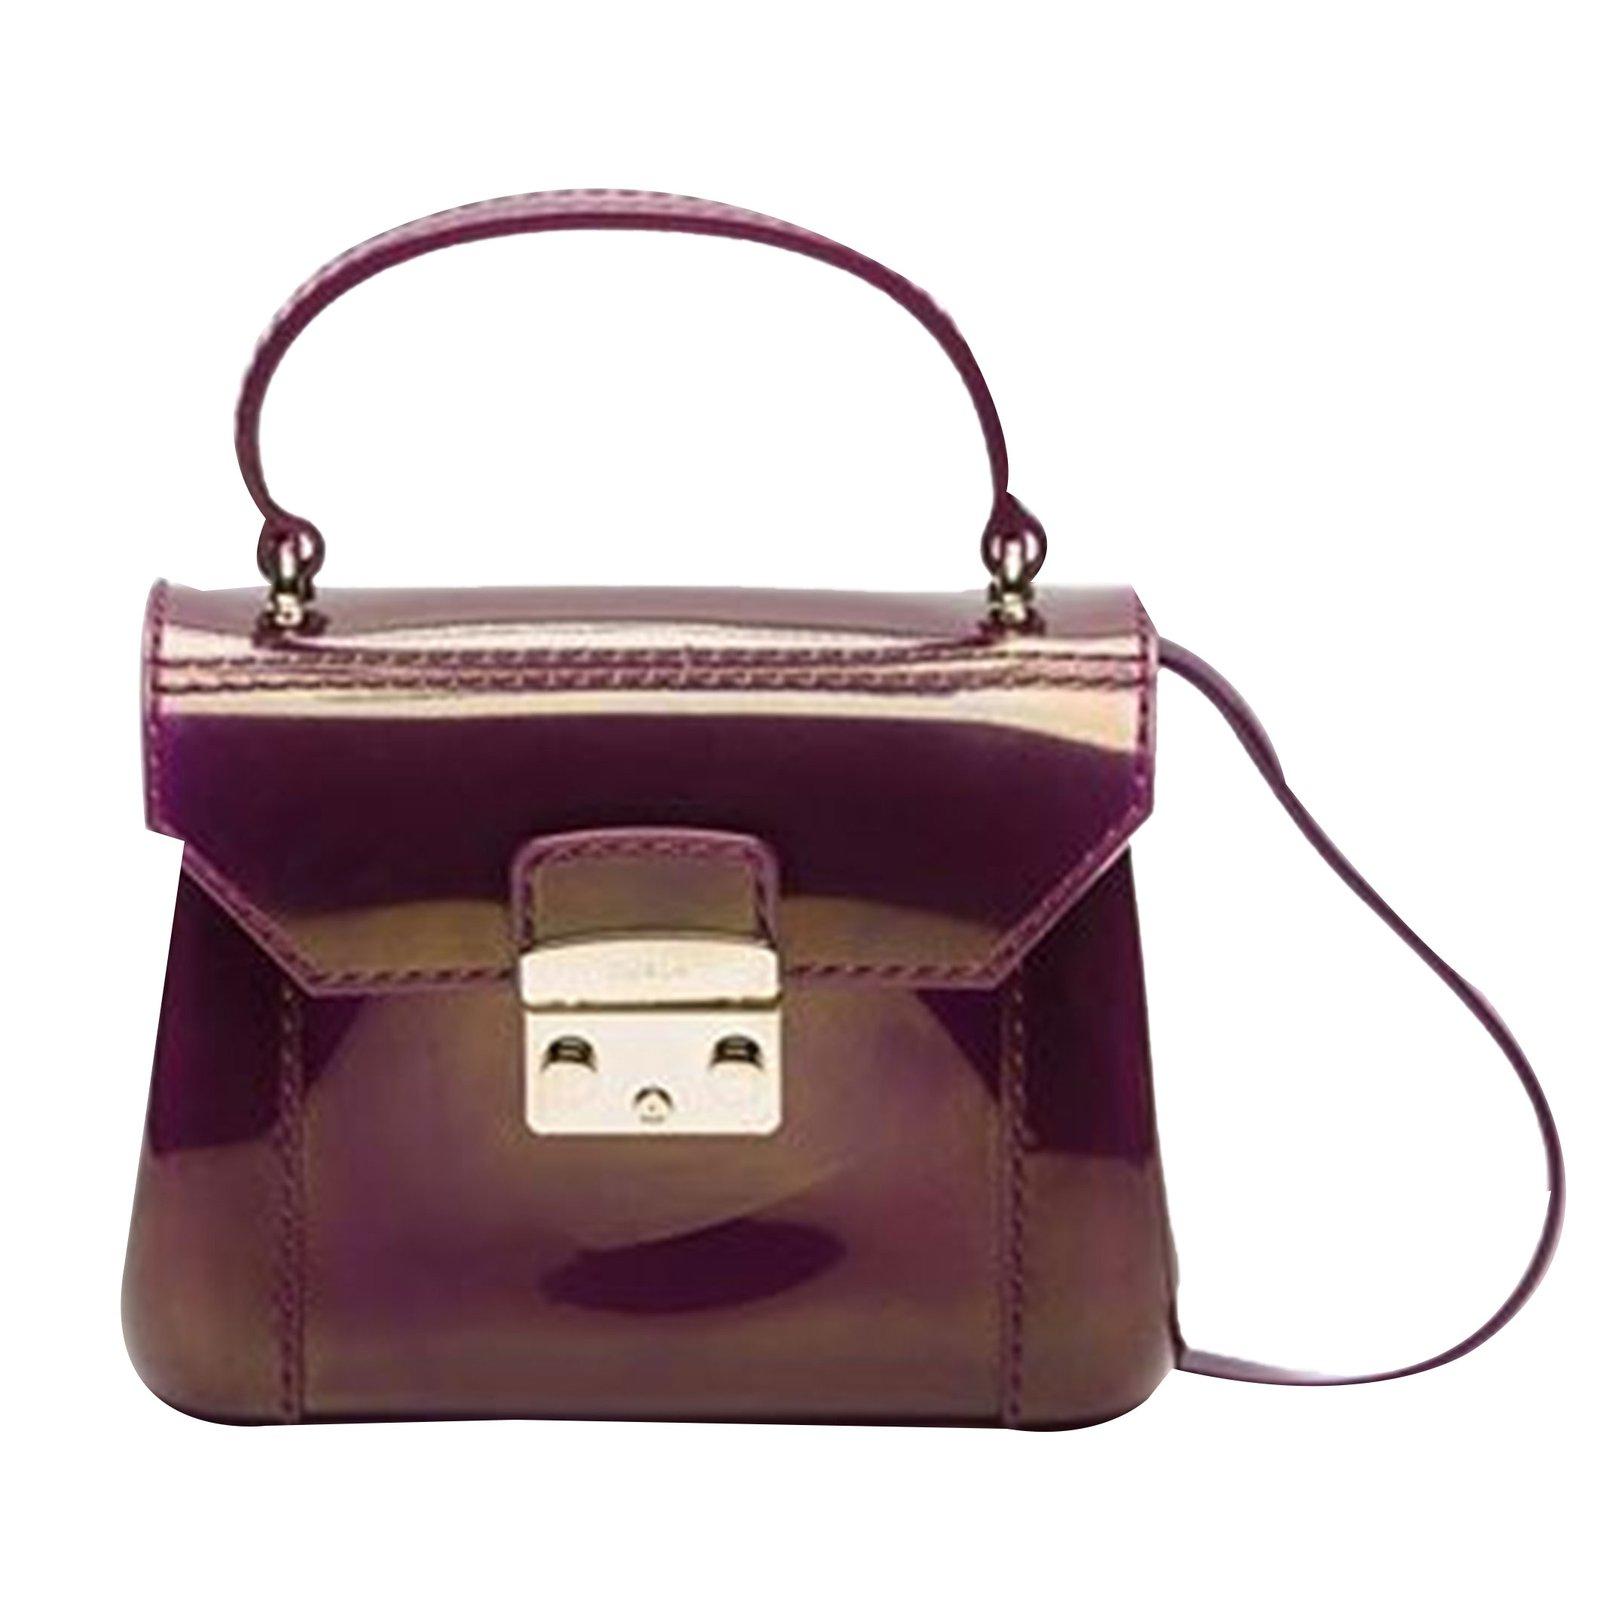 Furla Candy Handbags Plastic Purple Ref 58223